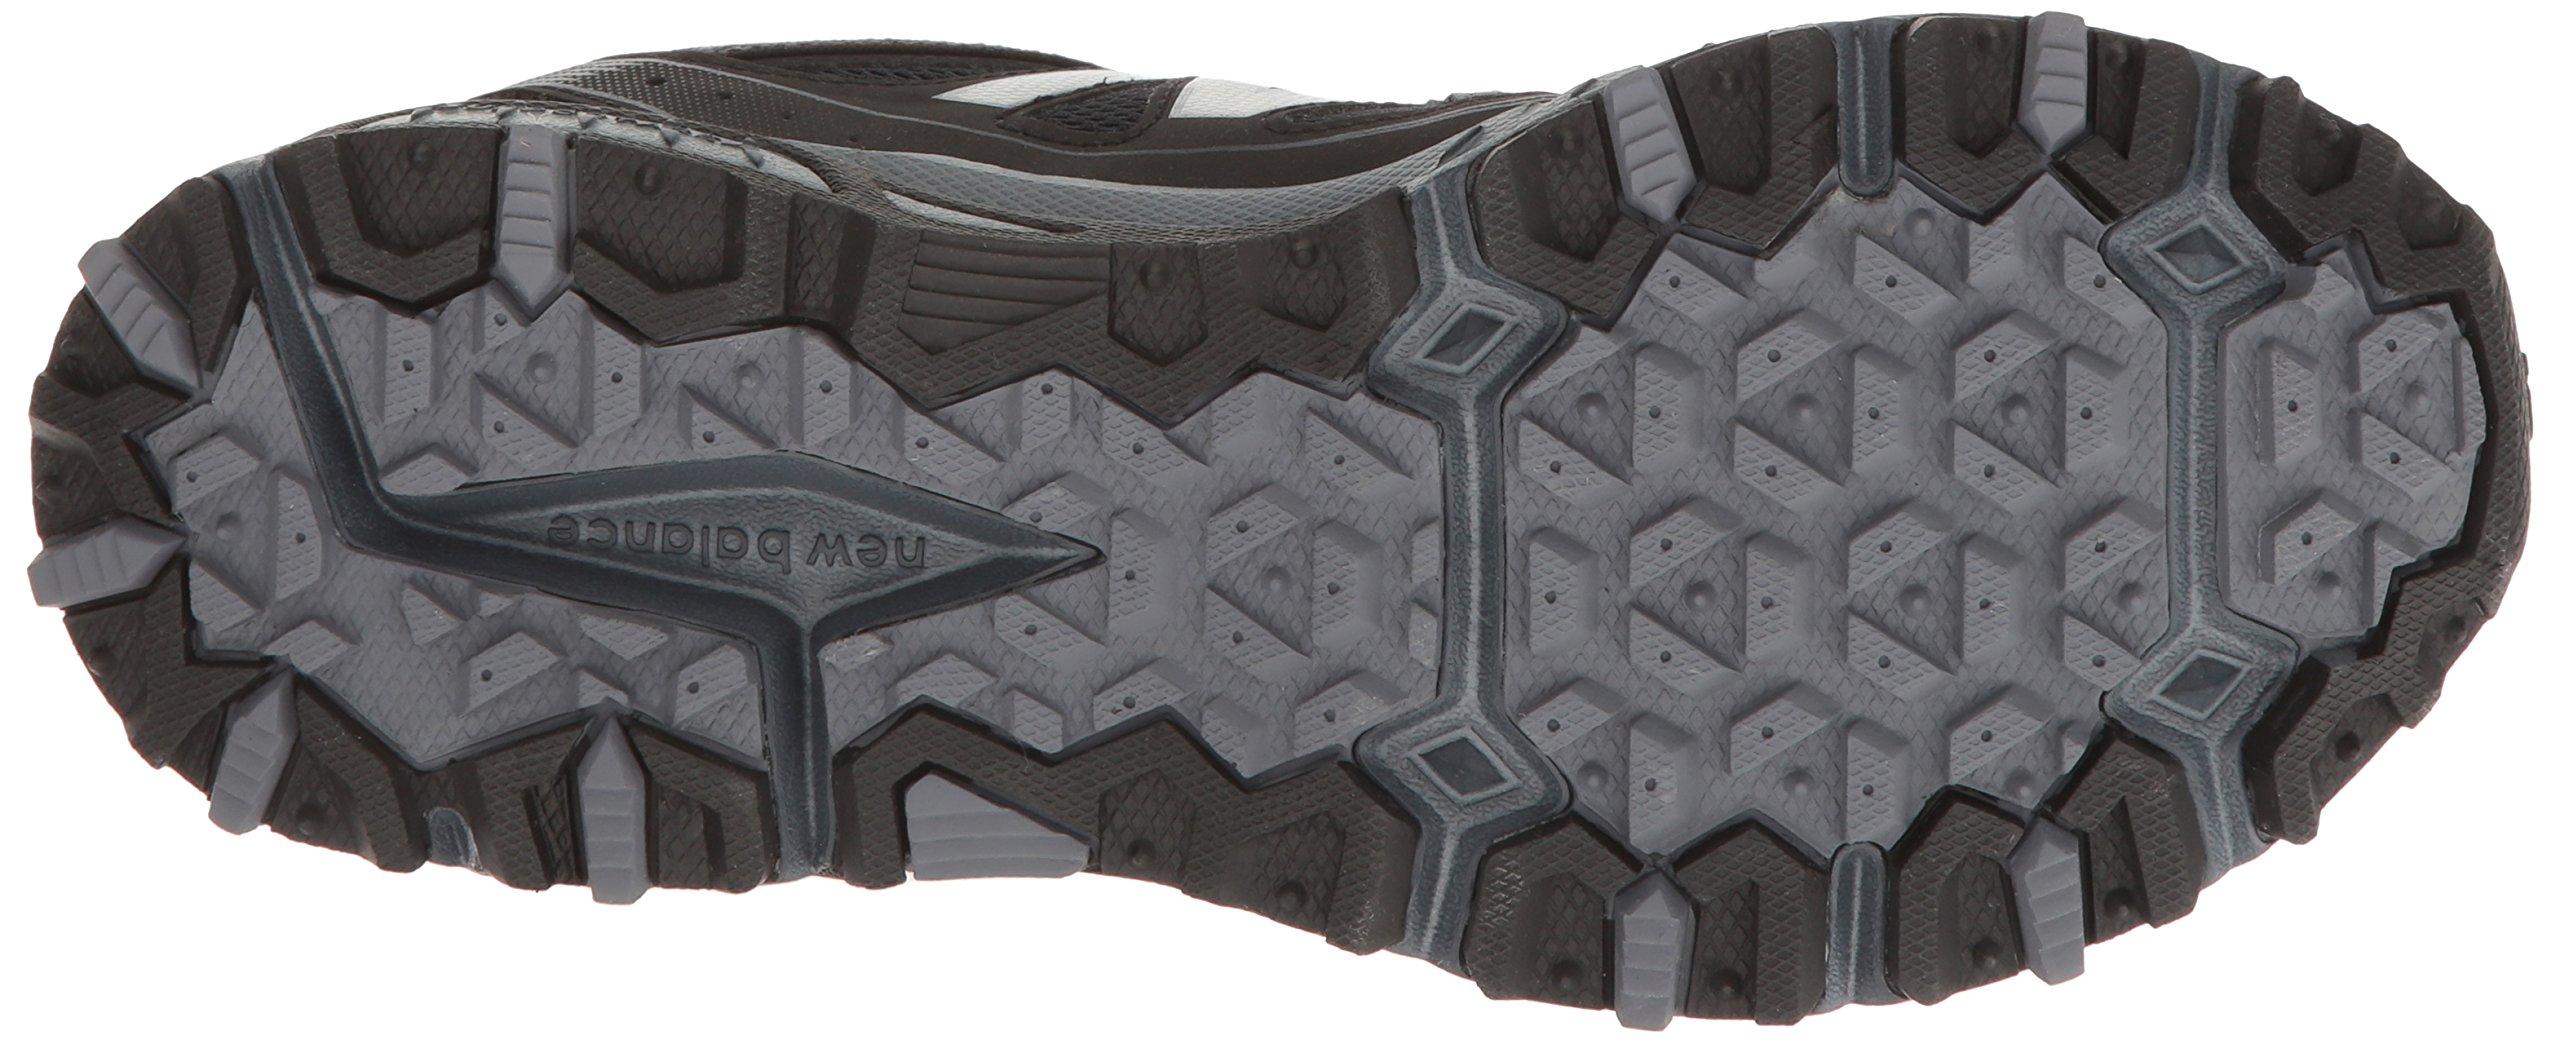 New Balance Men's MT410v5 Cushioning Trail Running Shoe, Black, 7 D US by New Balance (Image #3)